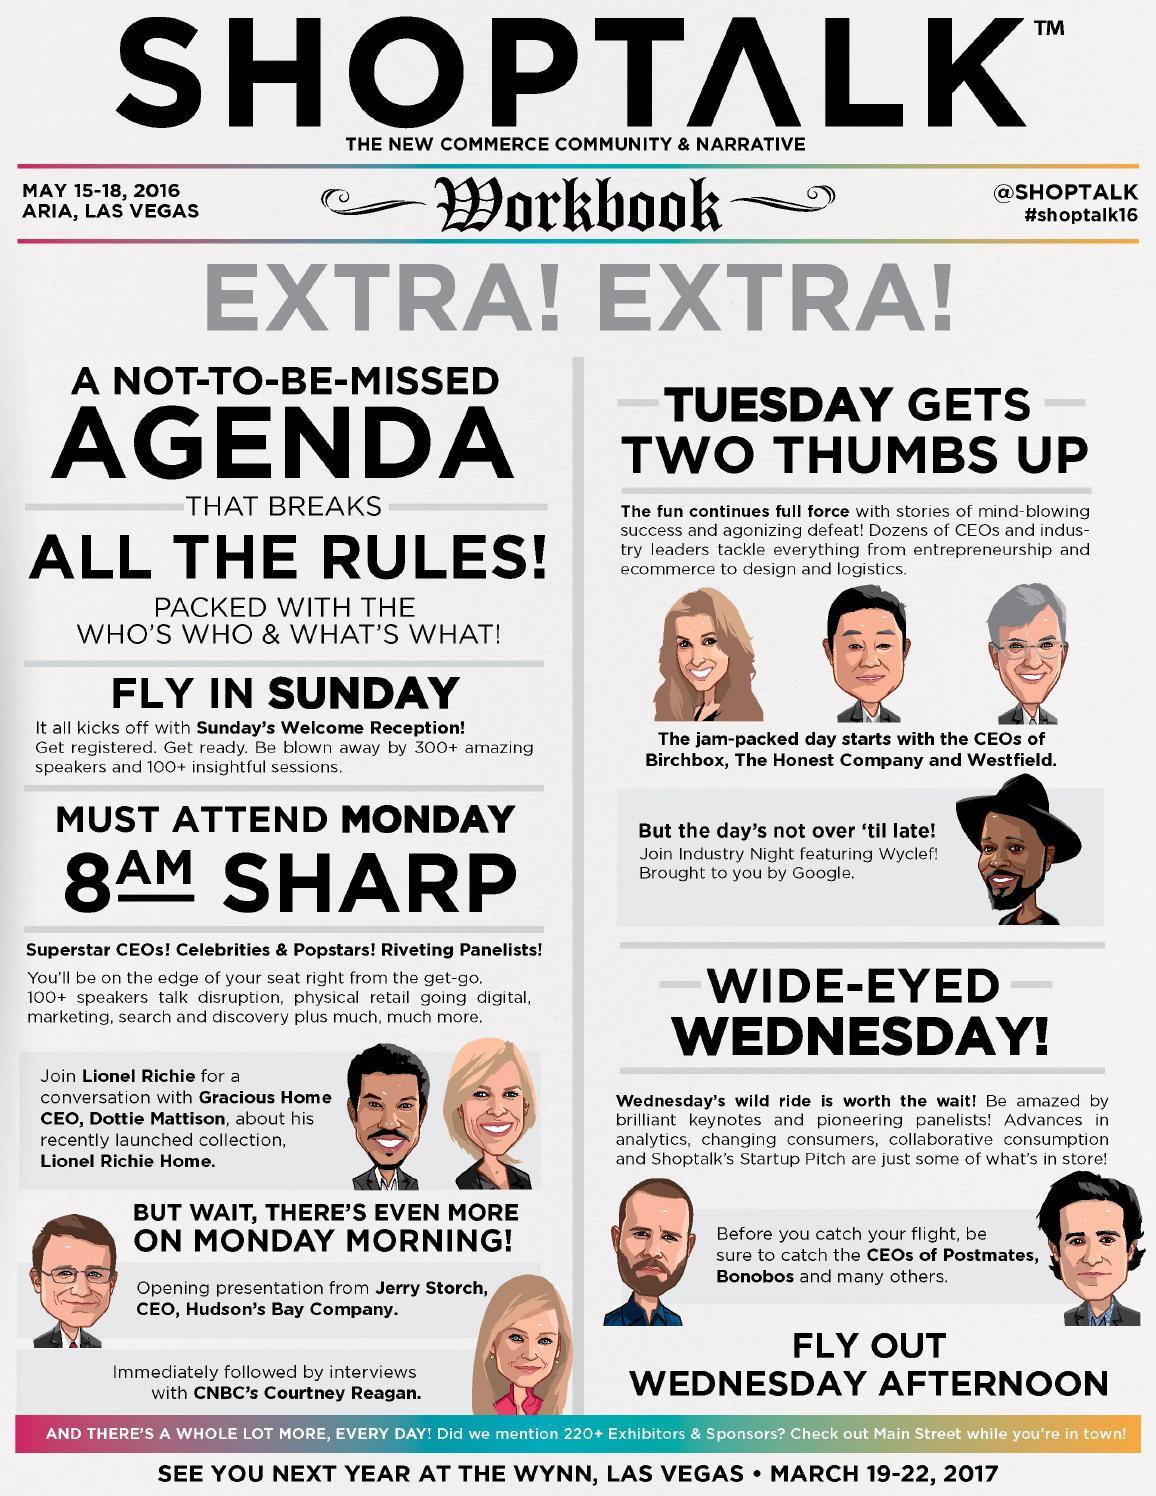 Shoptak 2016 Workbook by Shoptalk - issuu